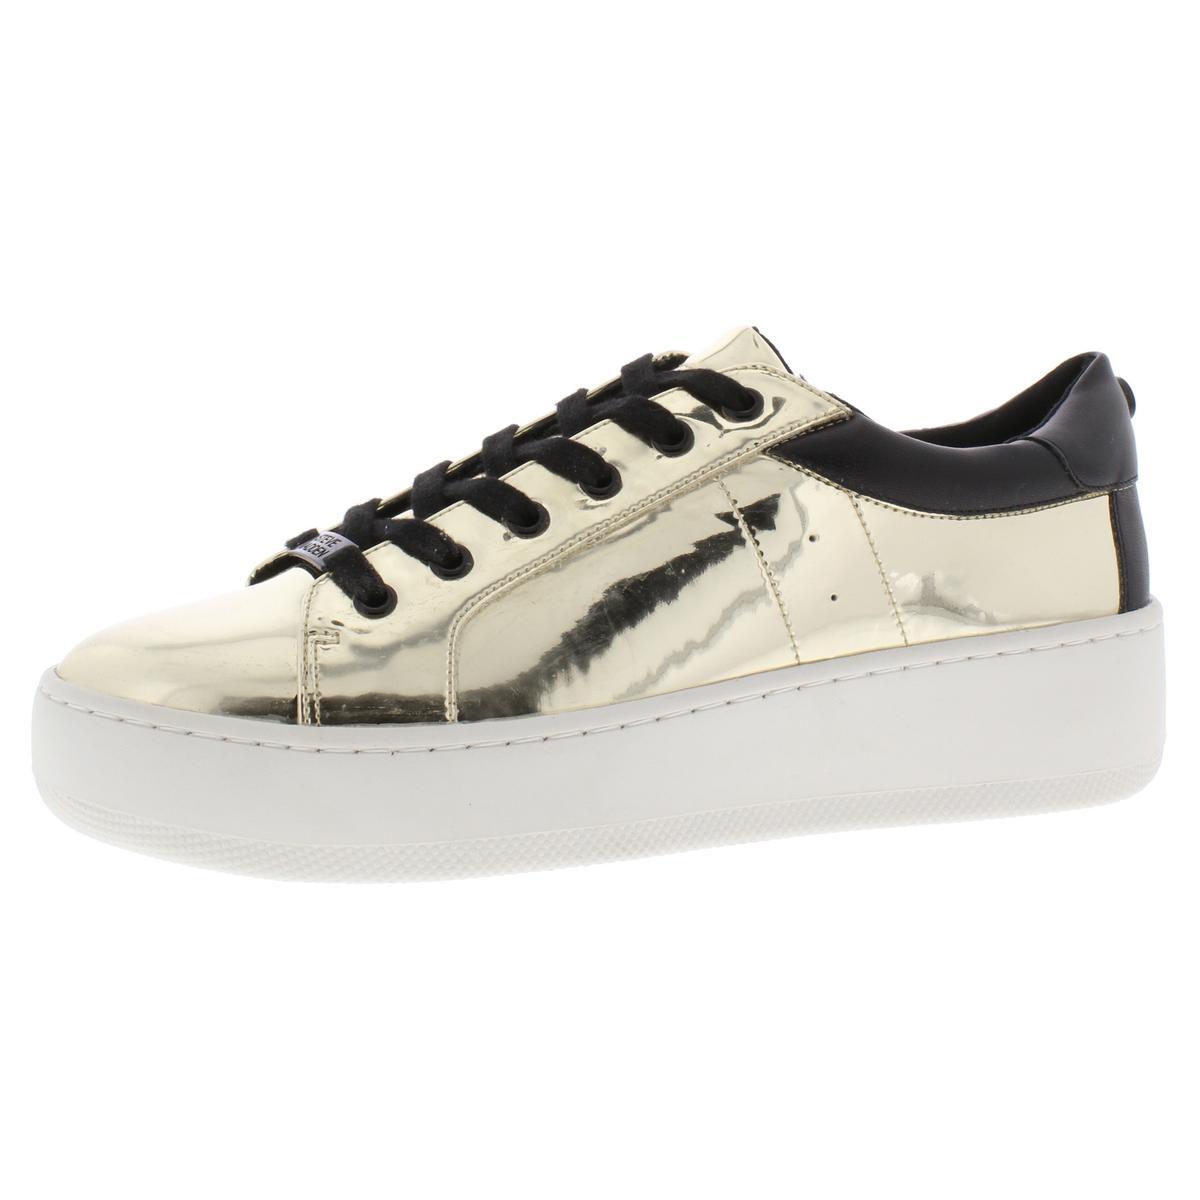 Naturalizer Womens Carrigan Suede High Top Fashion Sneakers Shoes BHFO 9883